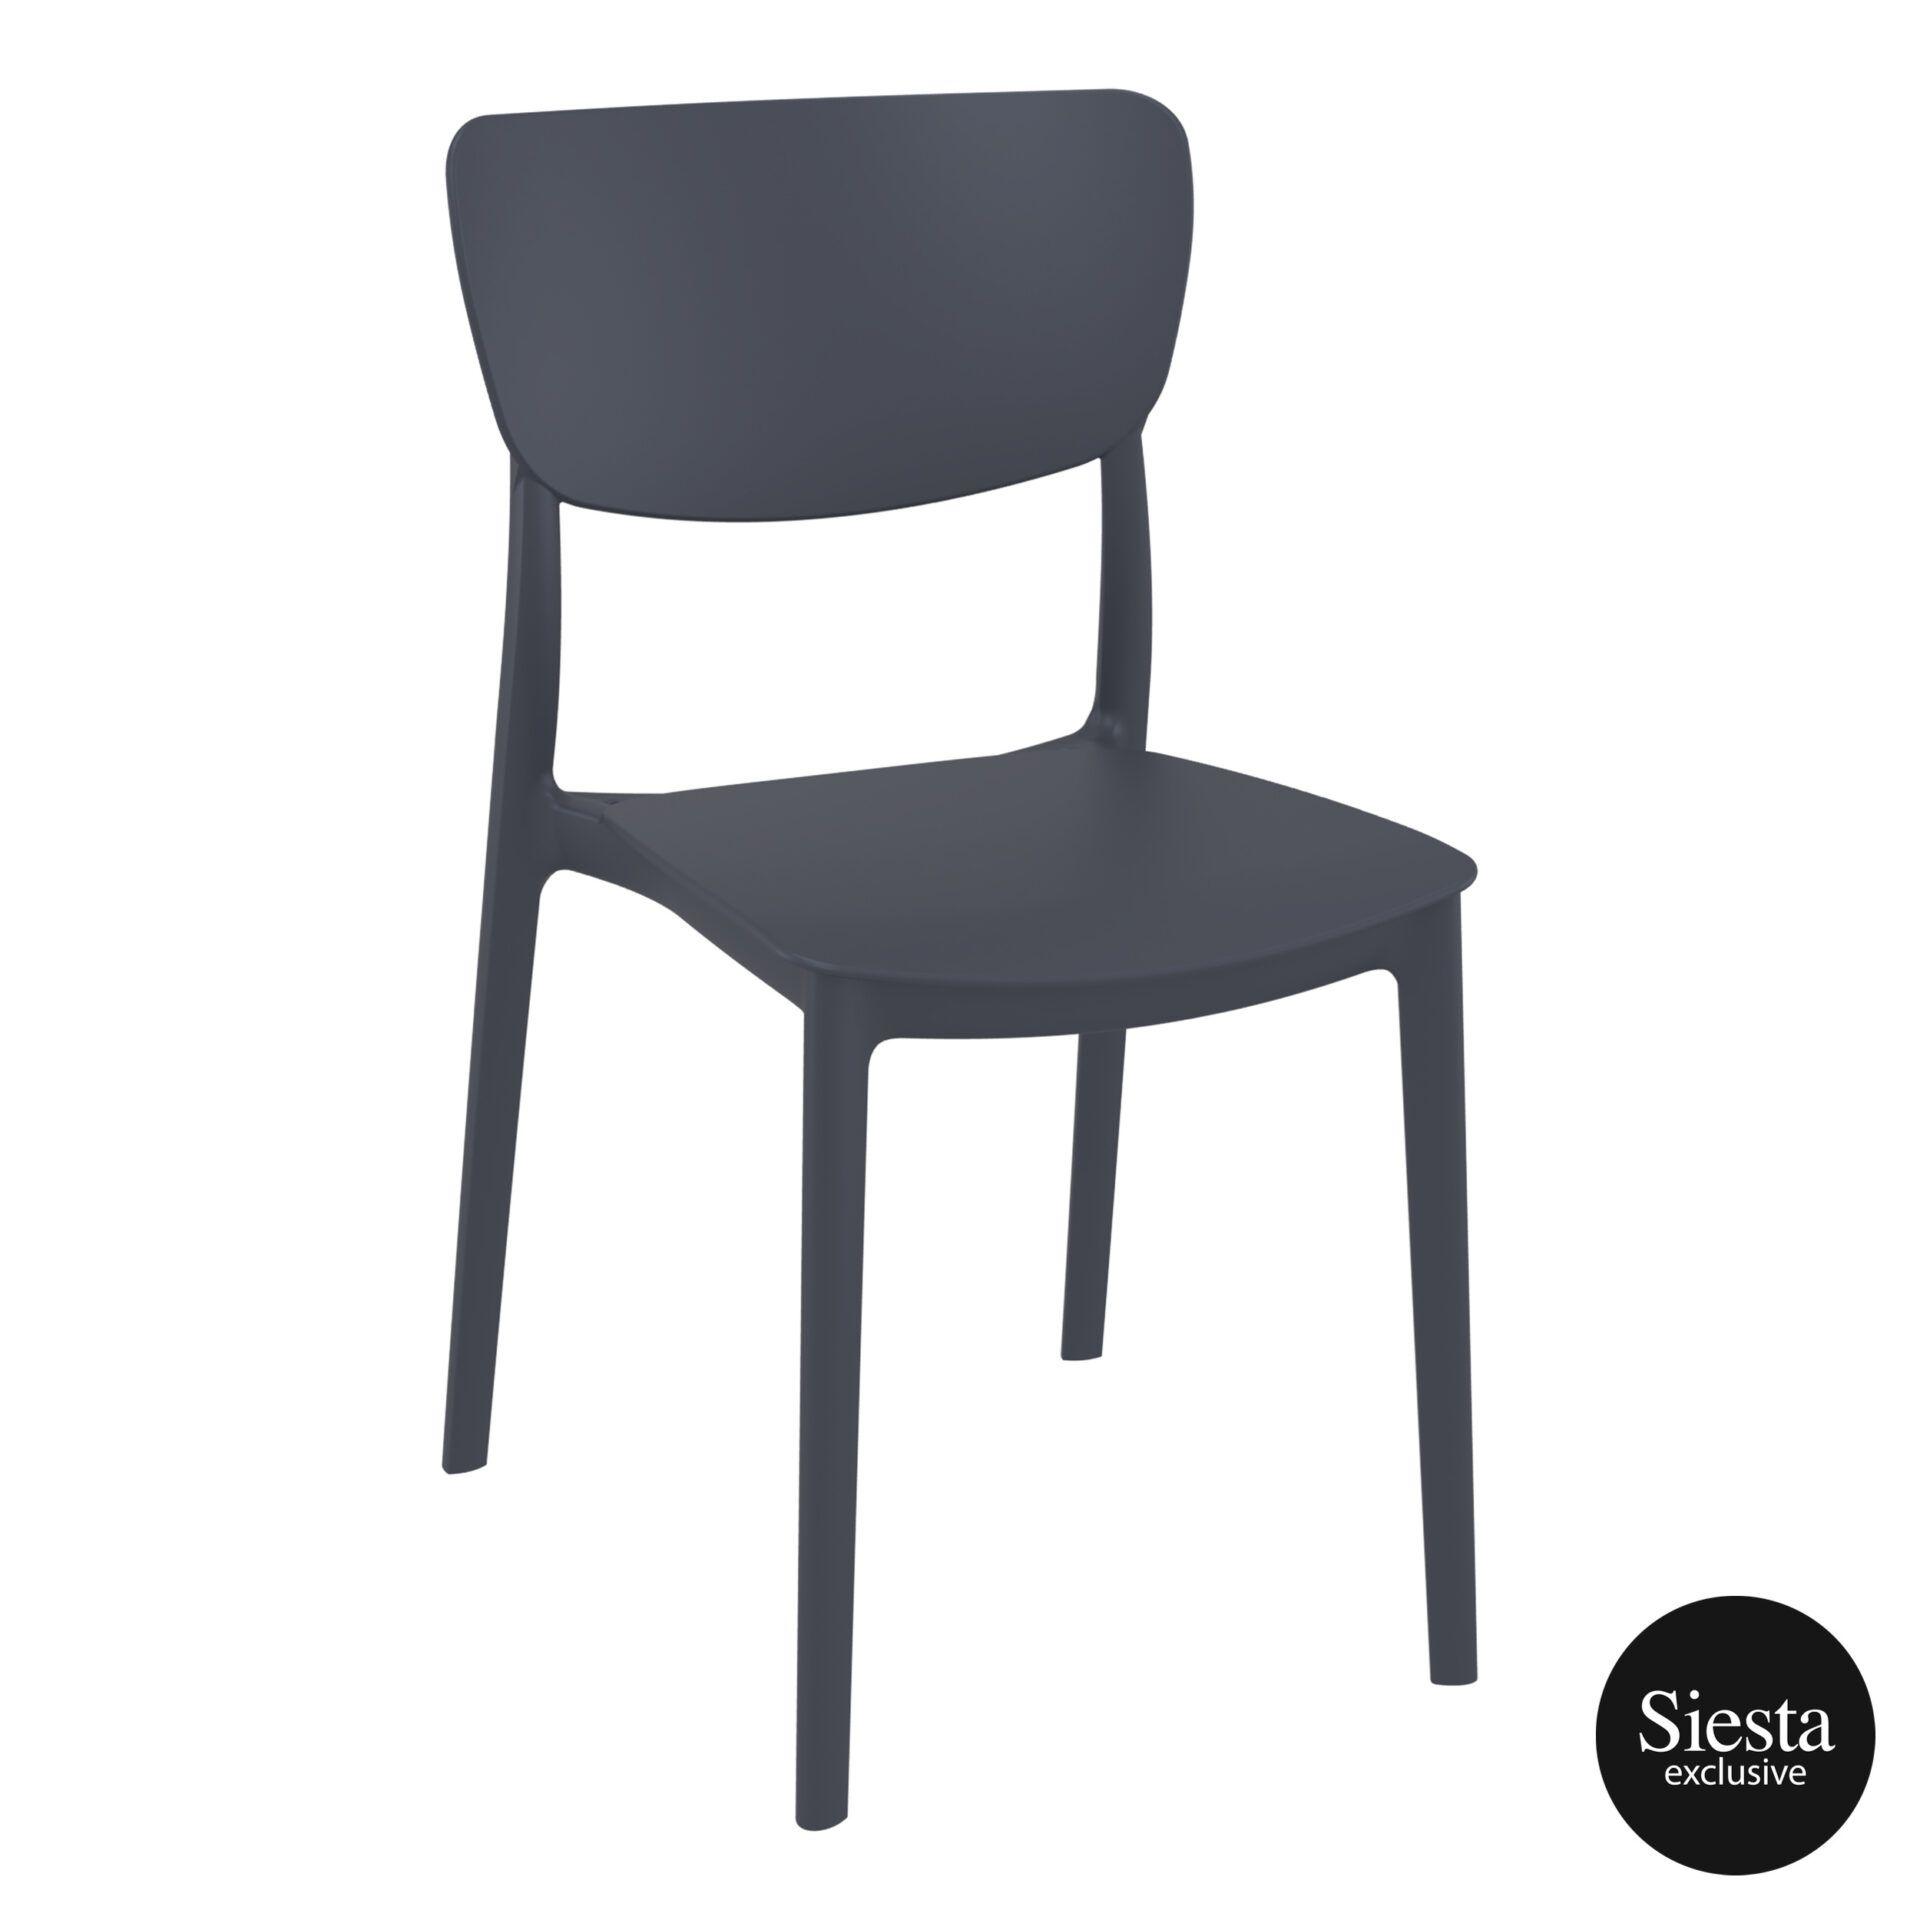 polypropylene outdoor dining monna chair darkgrey front side 2